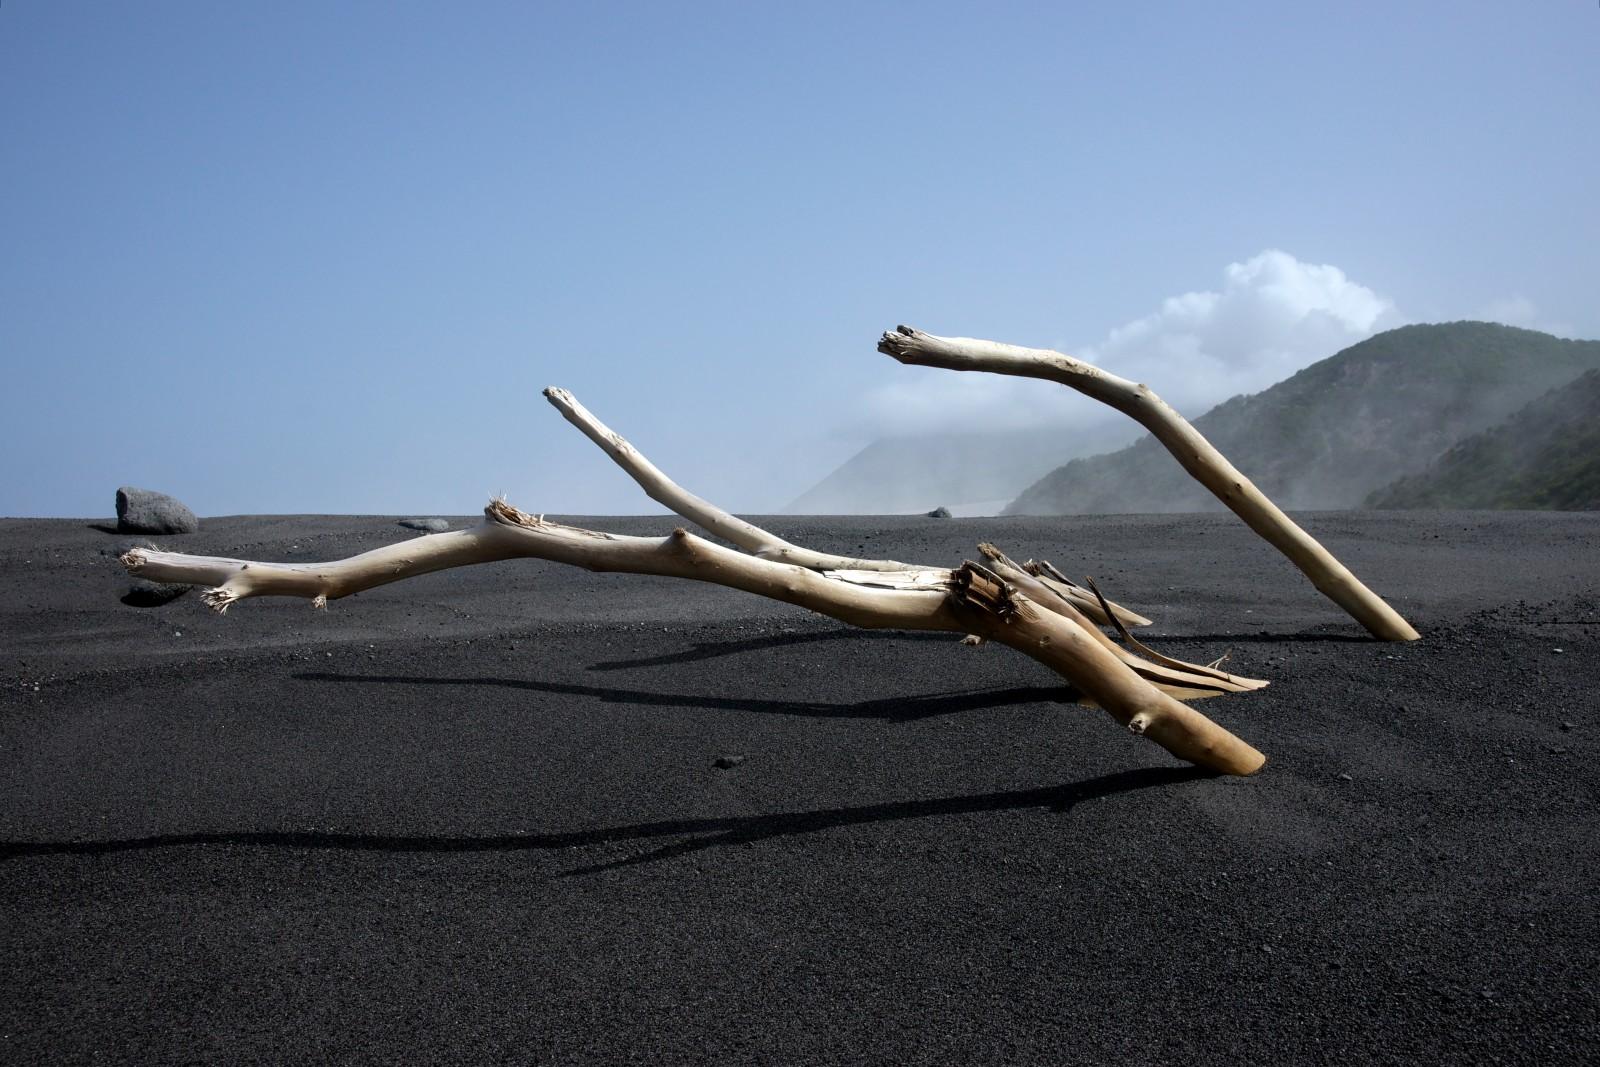 Pyroclastic flow, Montserrat. Credit: Alan Linde (distributed via imaggeo.egu.eu)